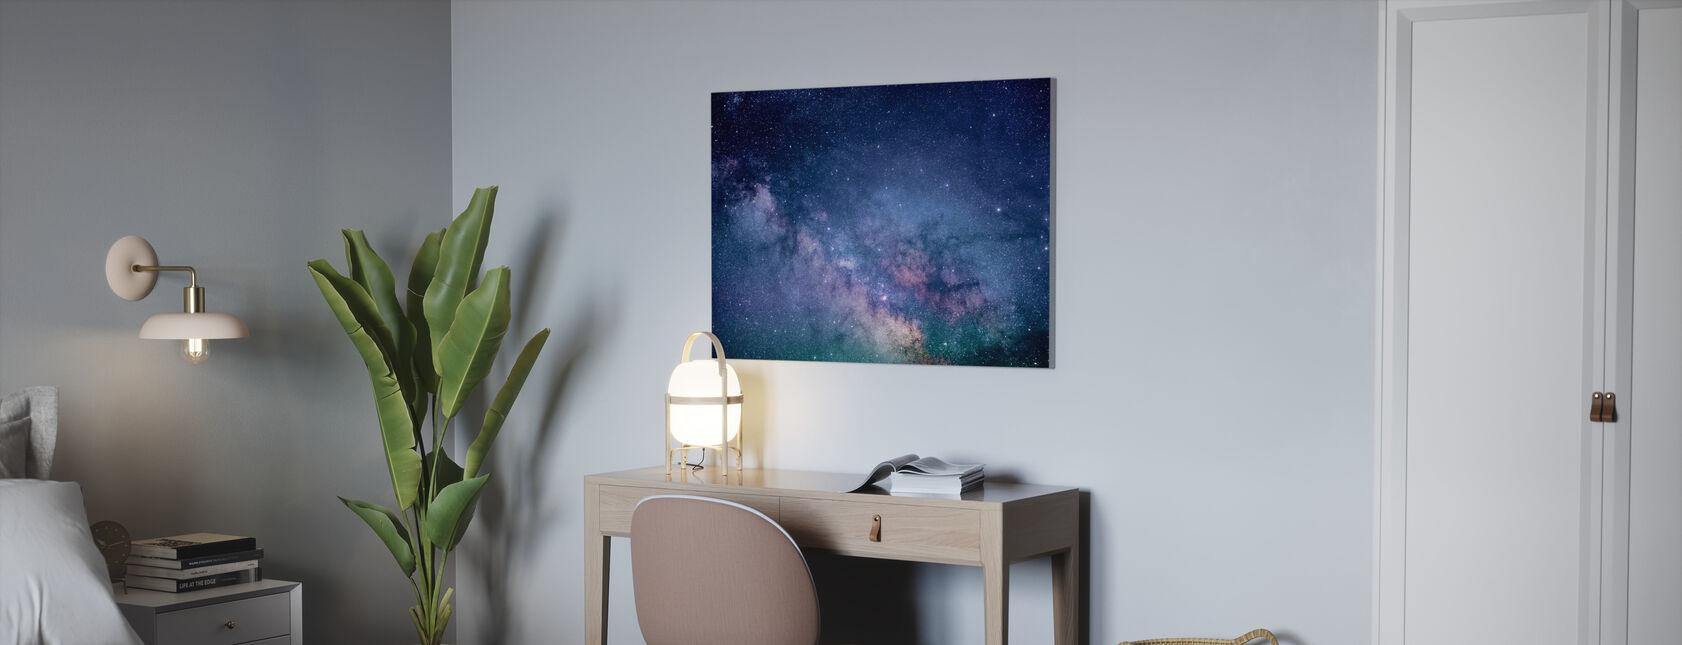 Galaxy Stars - Canvas print - Office